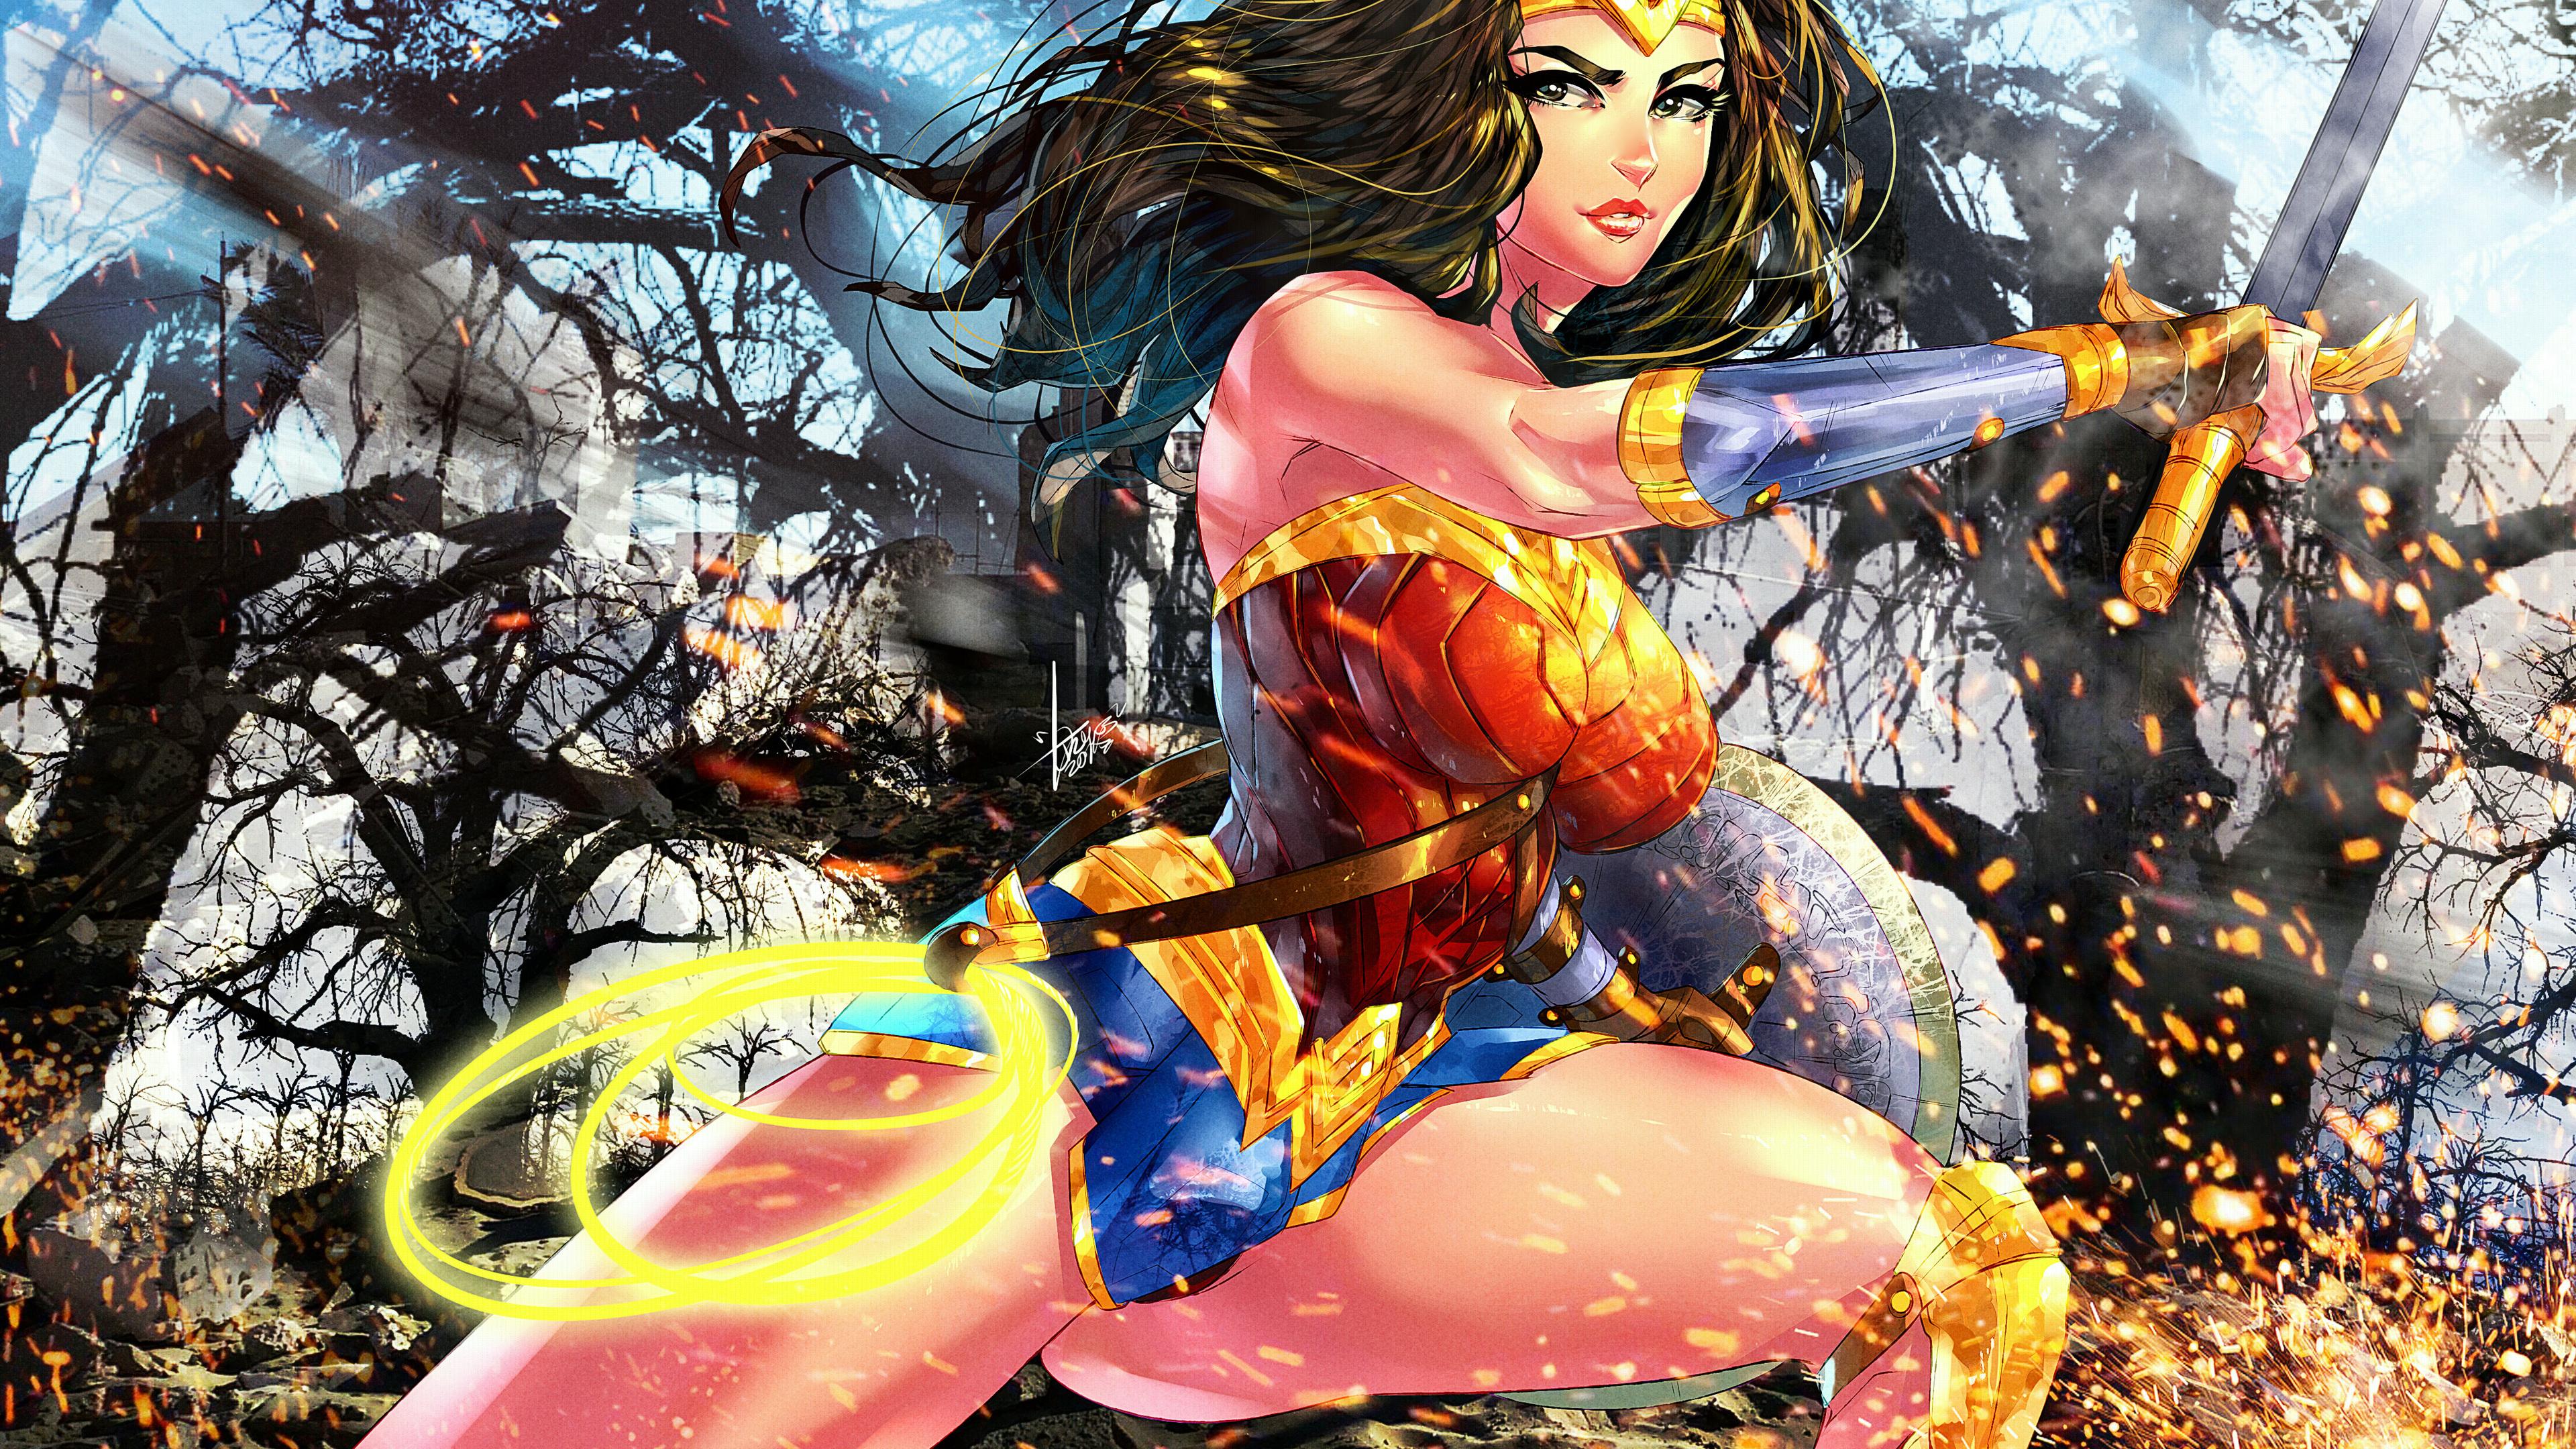 wonder woman colorful artwork 1536522616 - Wonder Woman Colorful Artwork - wonder woman wallpapers, superheroes wallpapers, hd-wallpapers, digital art wallpapers, artwork wallpapers, artist wallpapers, 4k-wallpapers